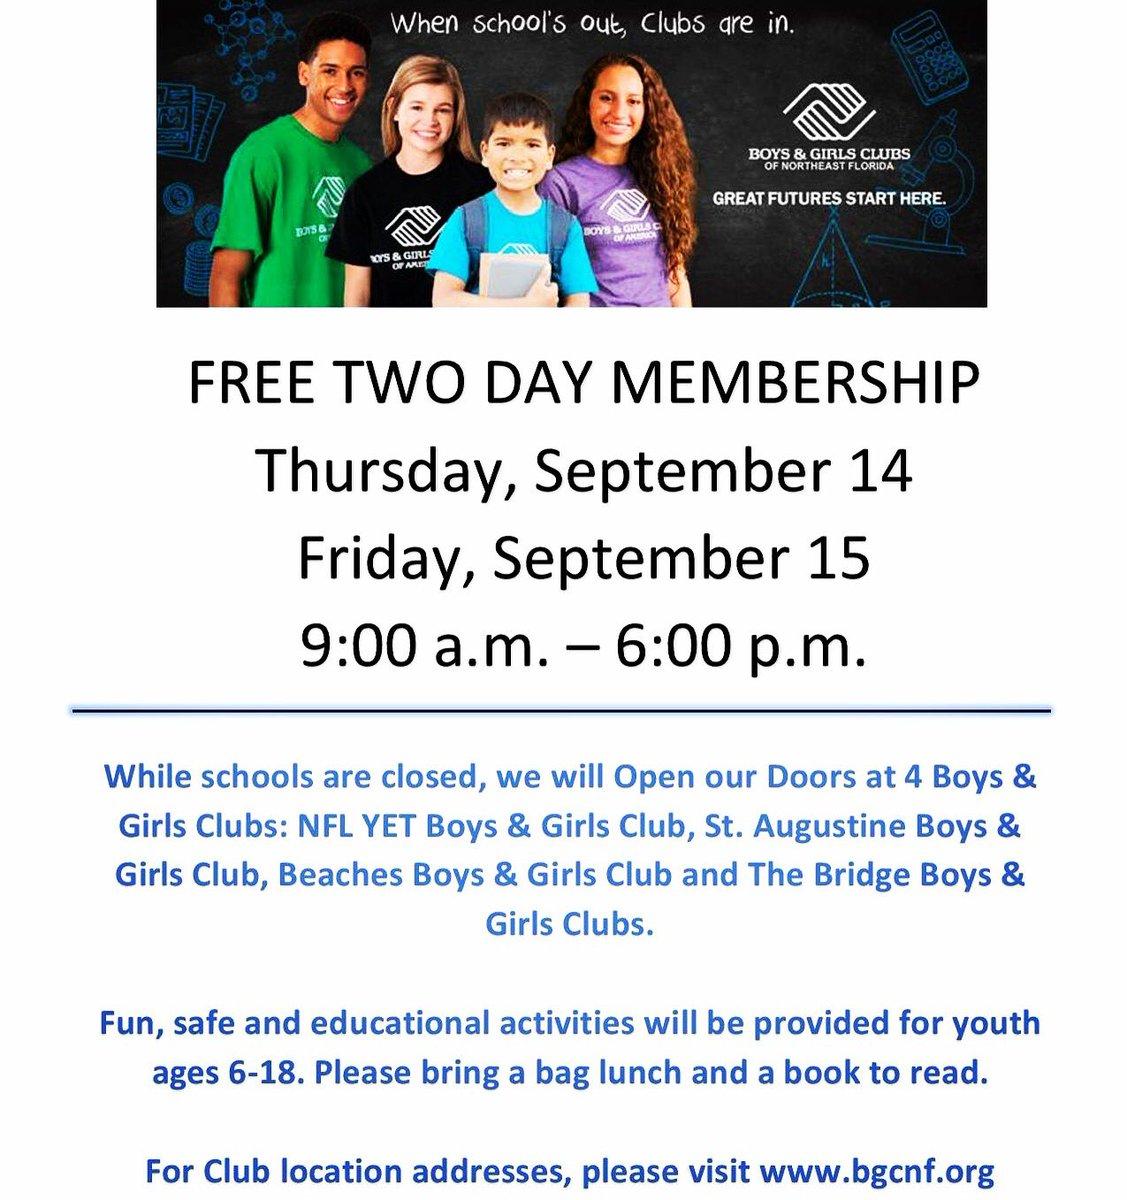 Membership free club penguin